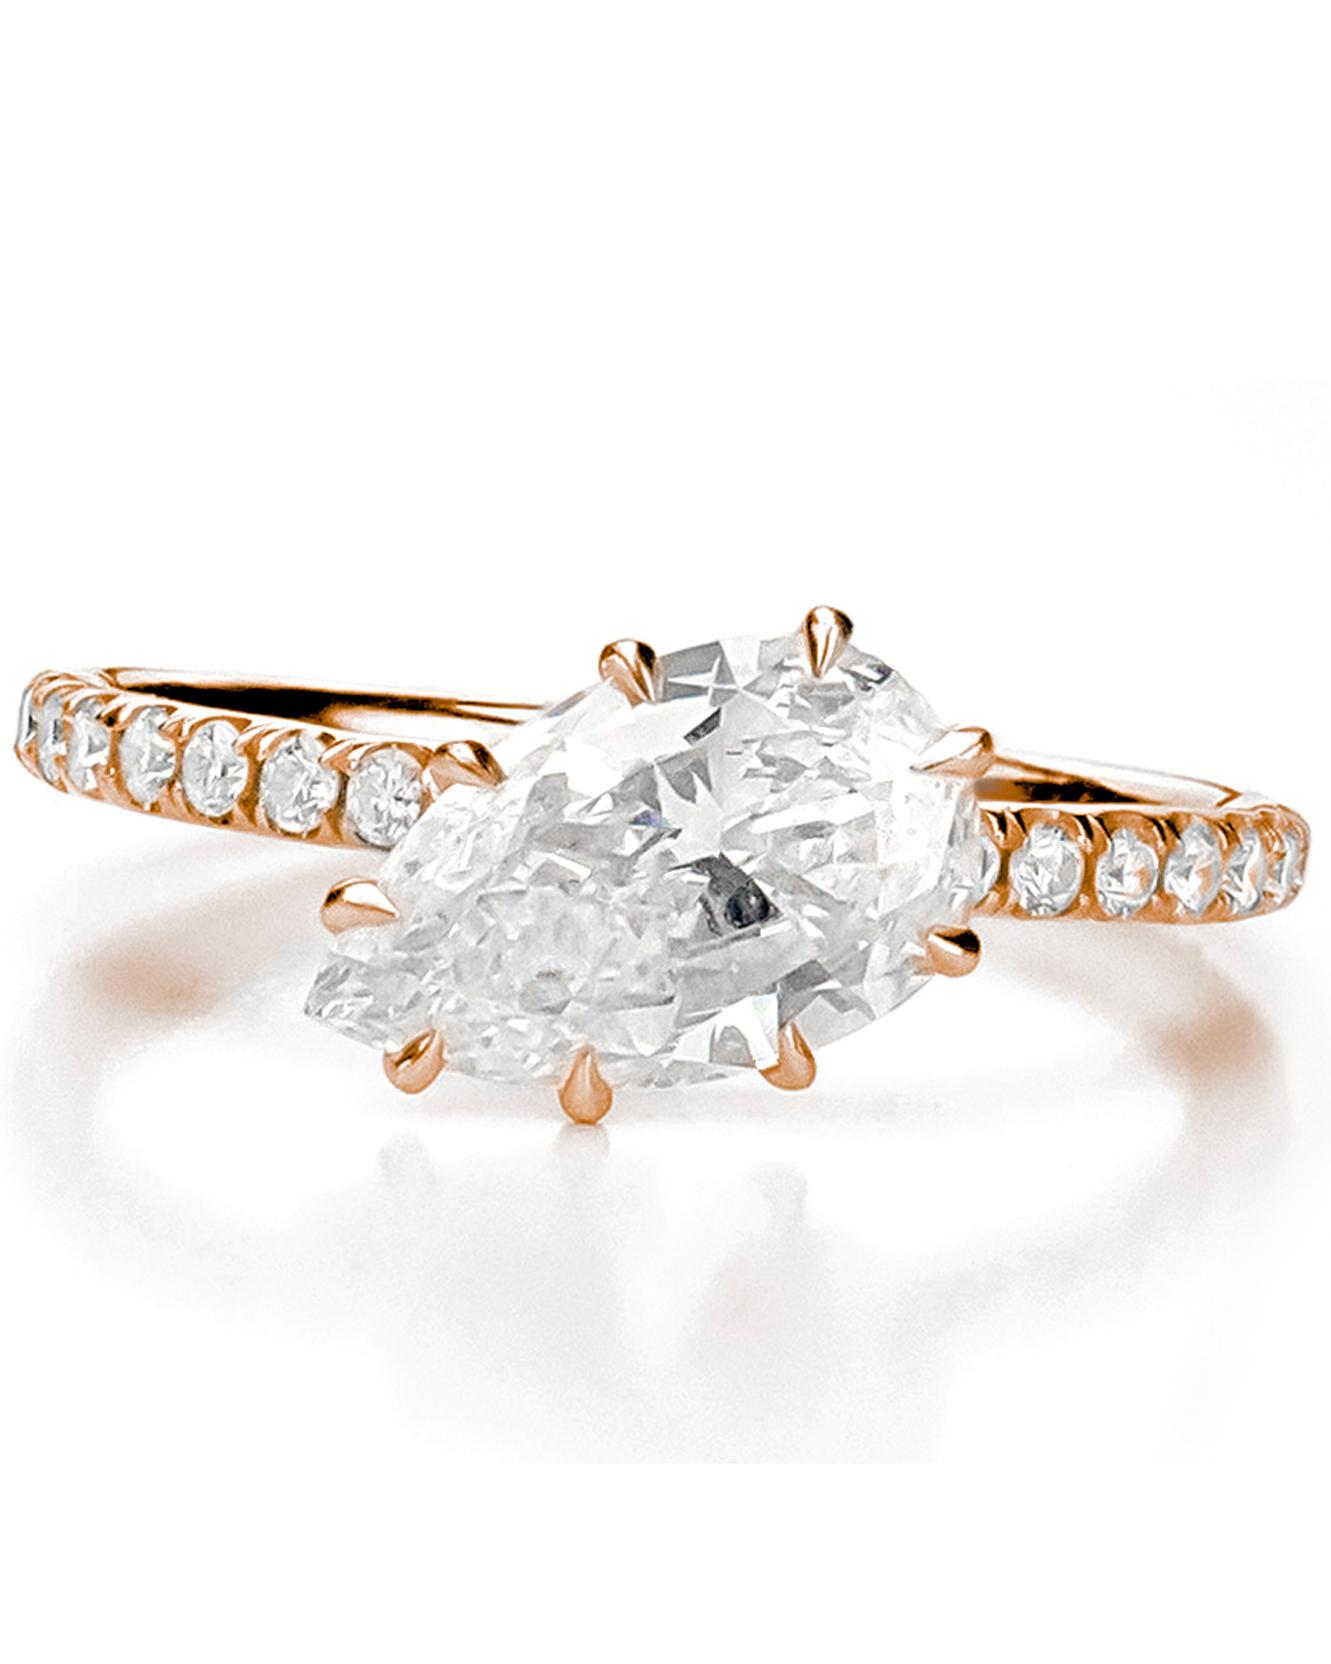 forevermark-jade-trau-rose-gold-free-bird-pear-solitaire-engagement-ring-0816.jpg